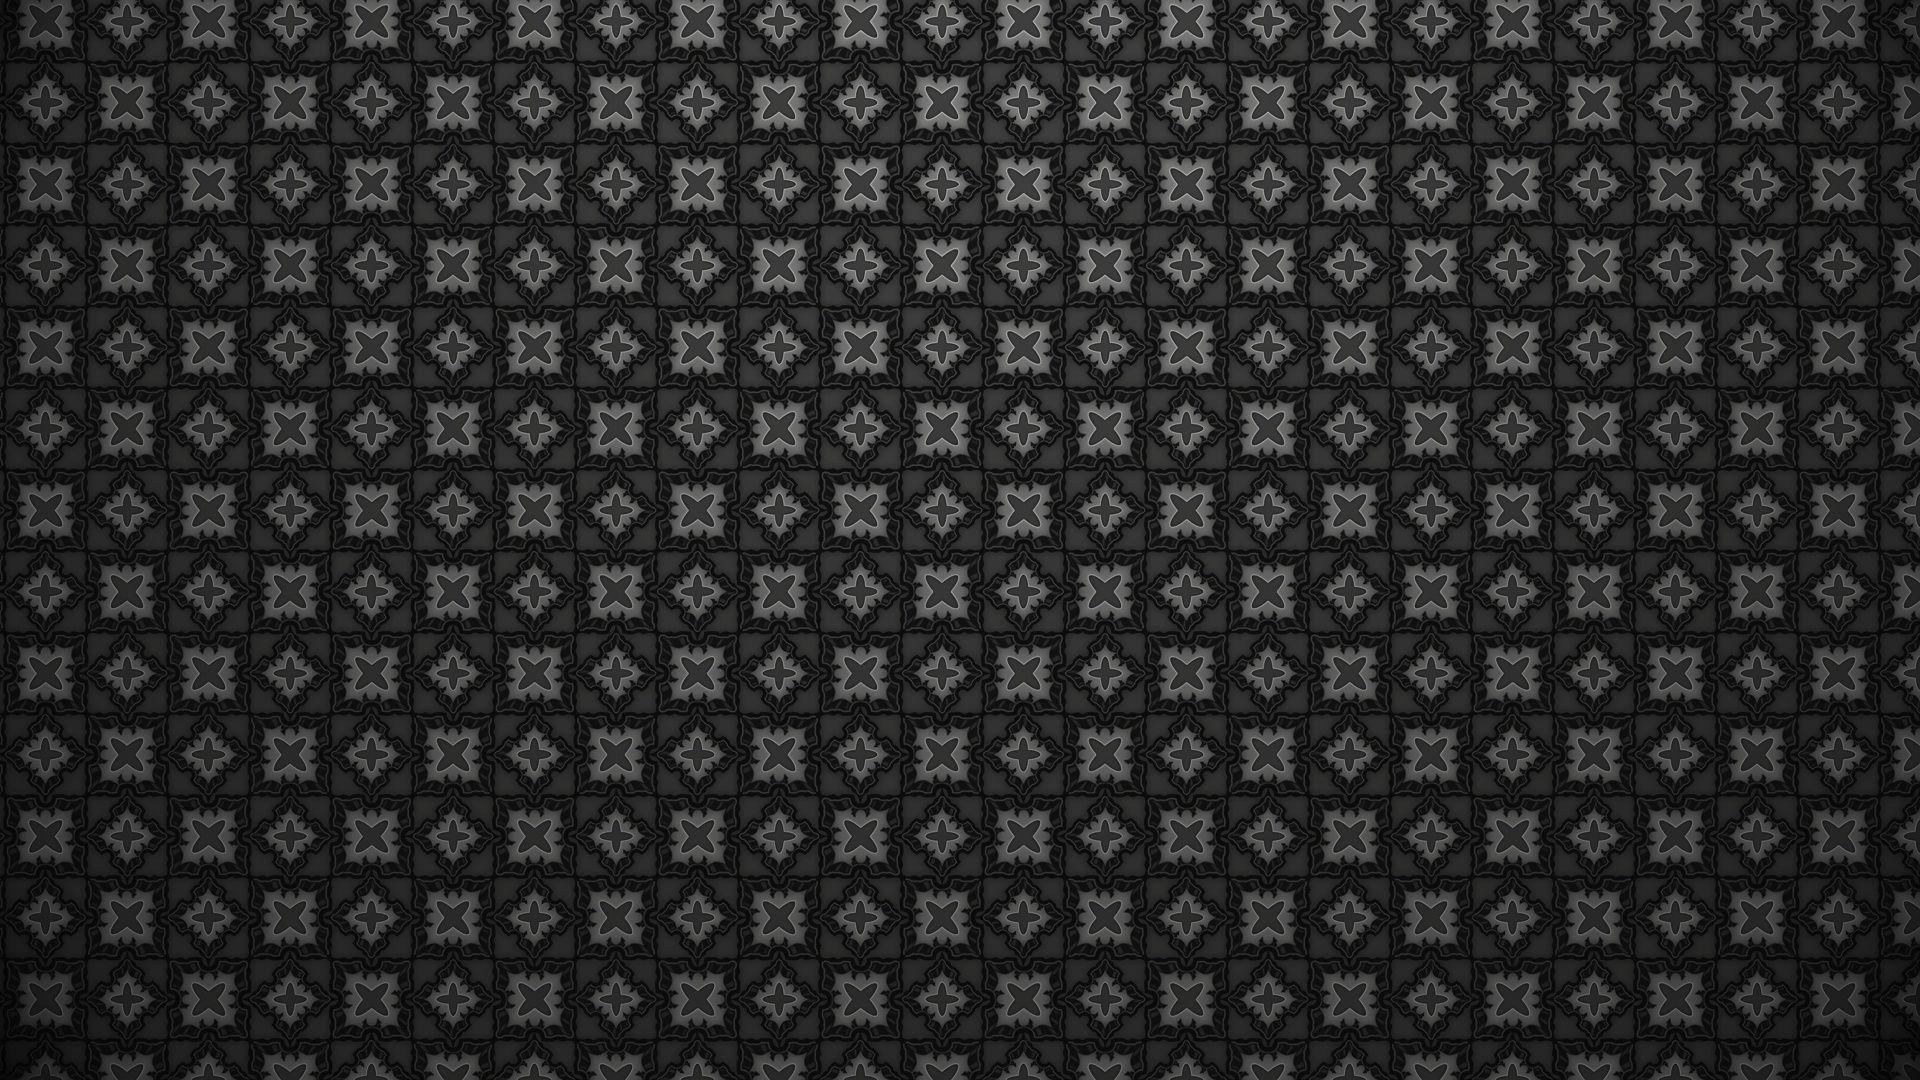 Wallpaper Texture Templates